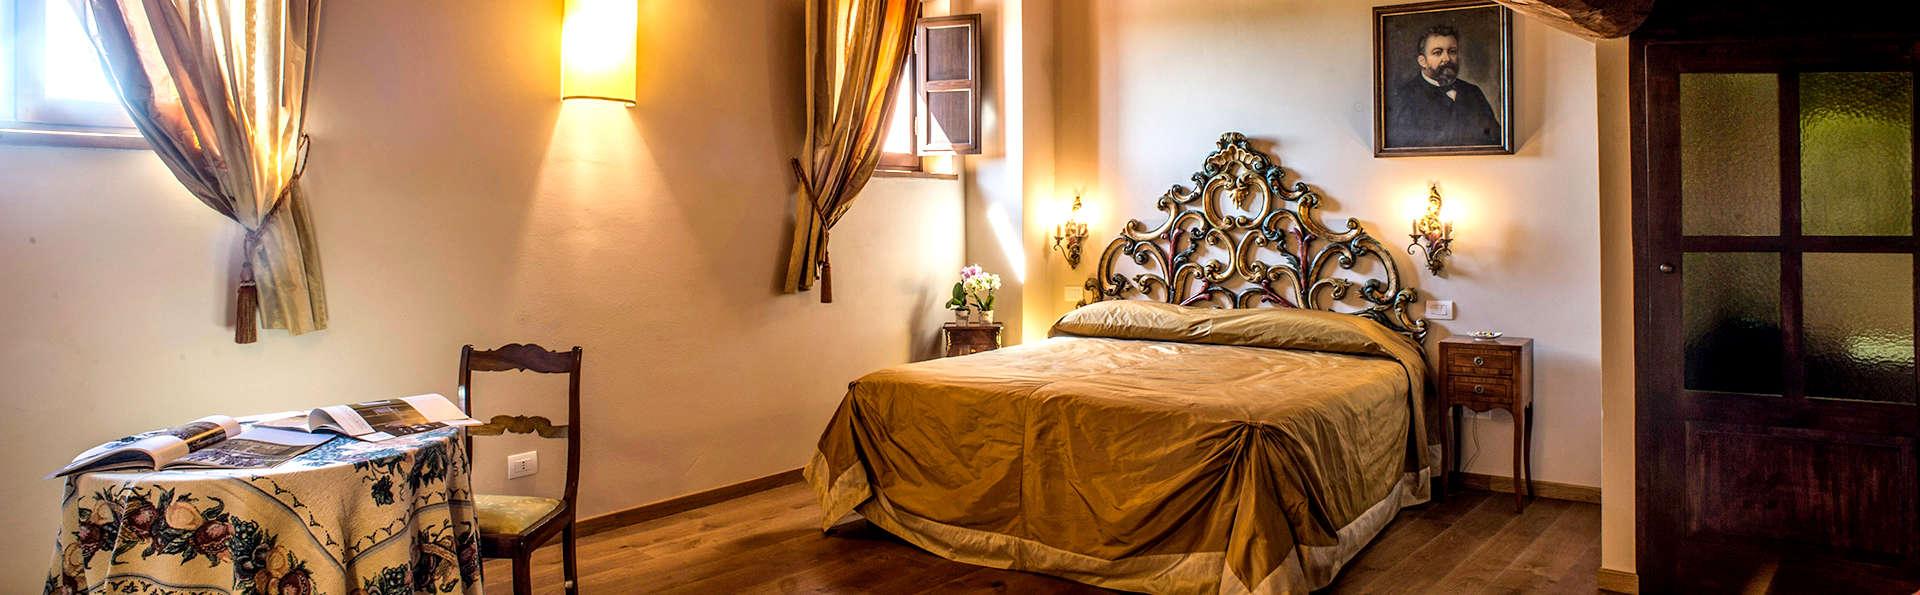 Palazzo Pacini - Edit_Room8.jpg